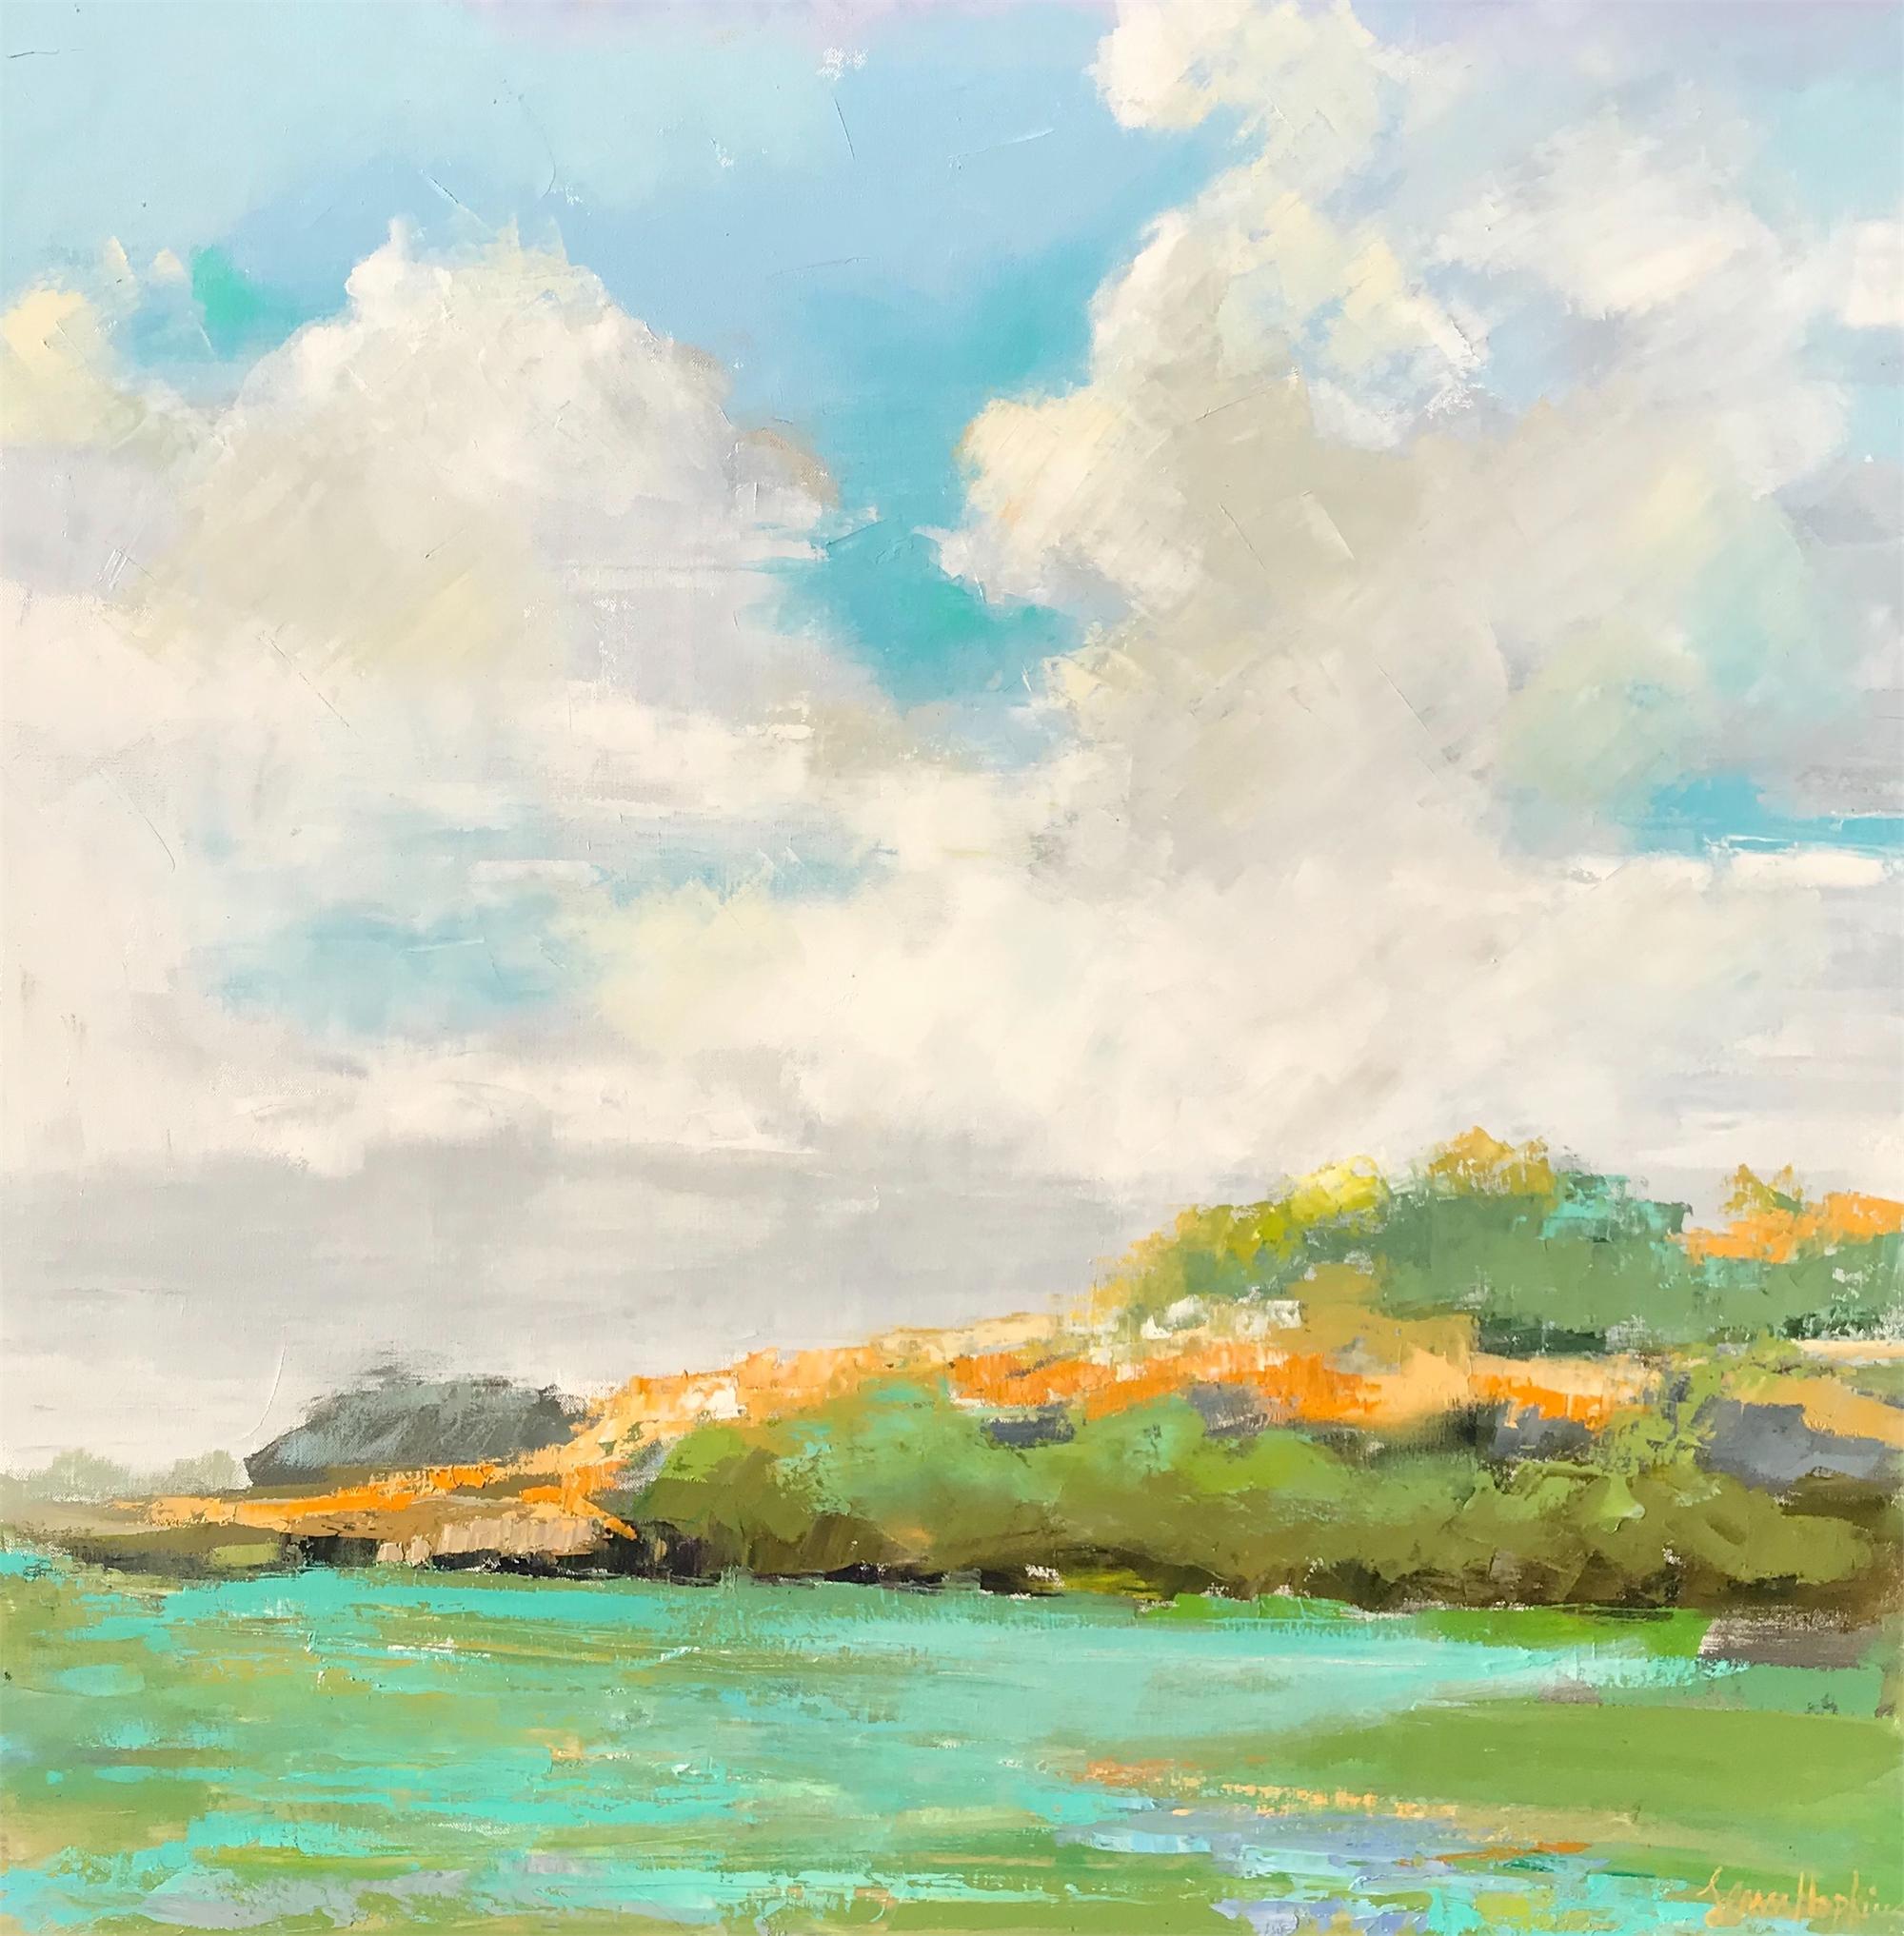 Lowland by Lenn Hopkins